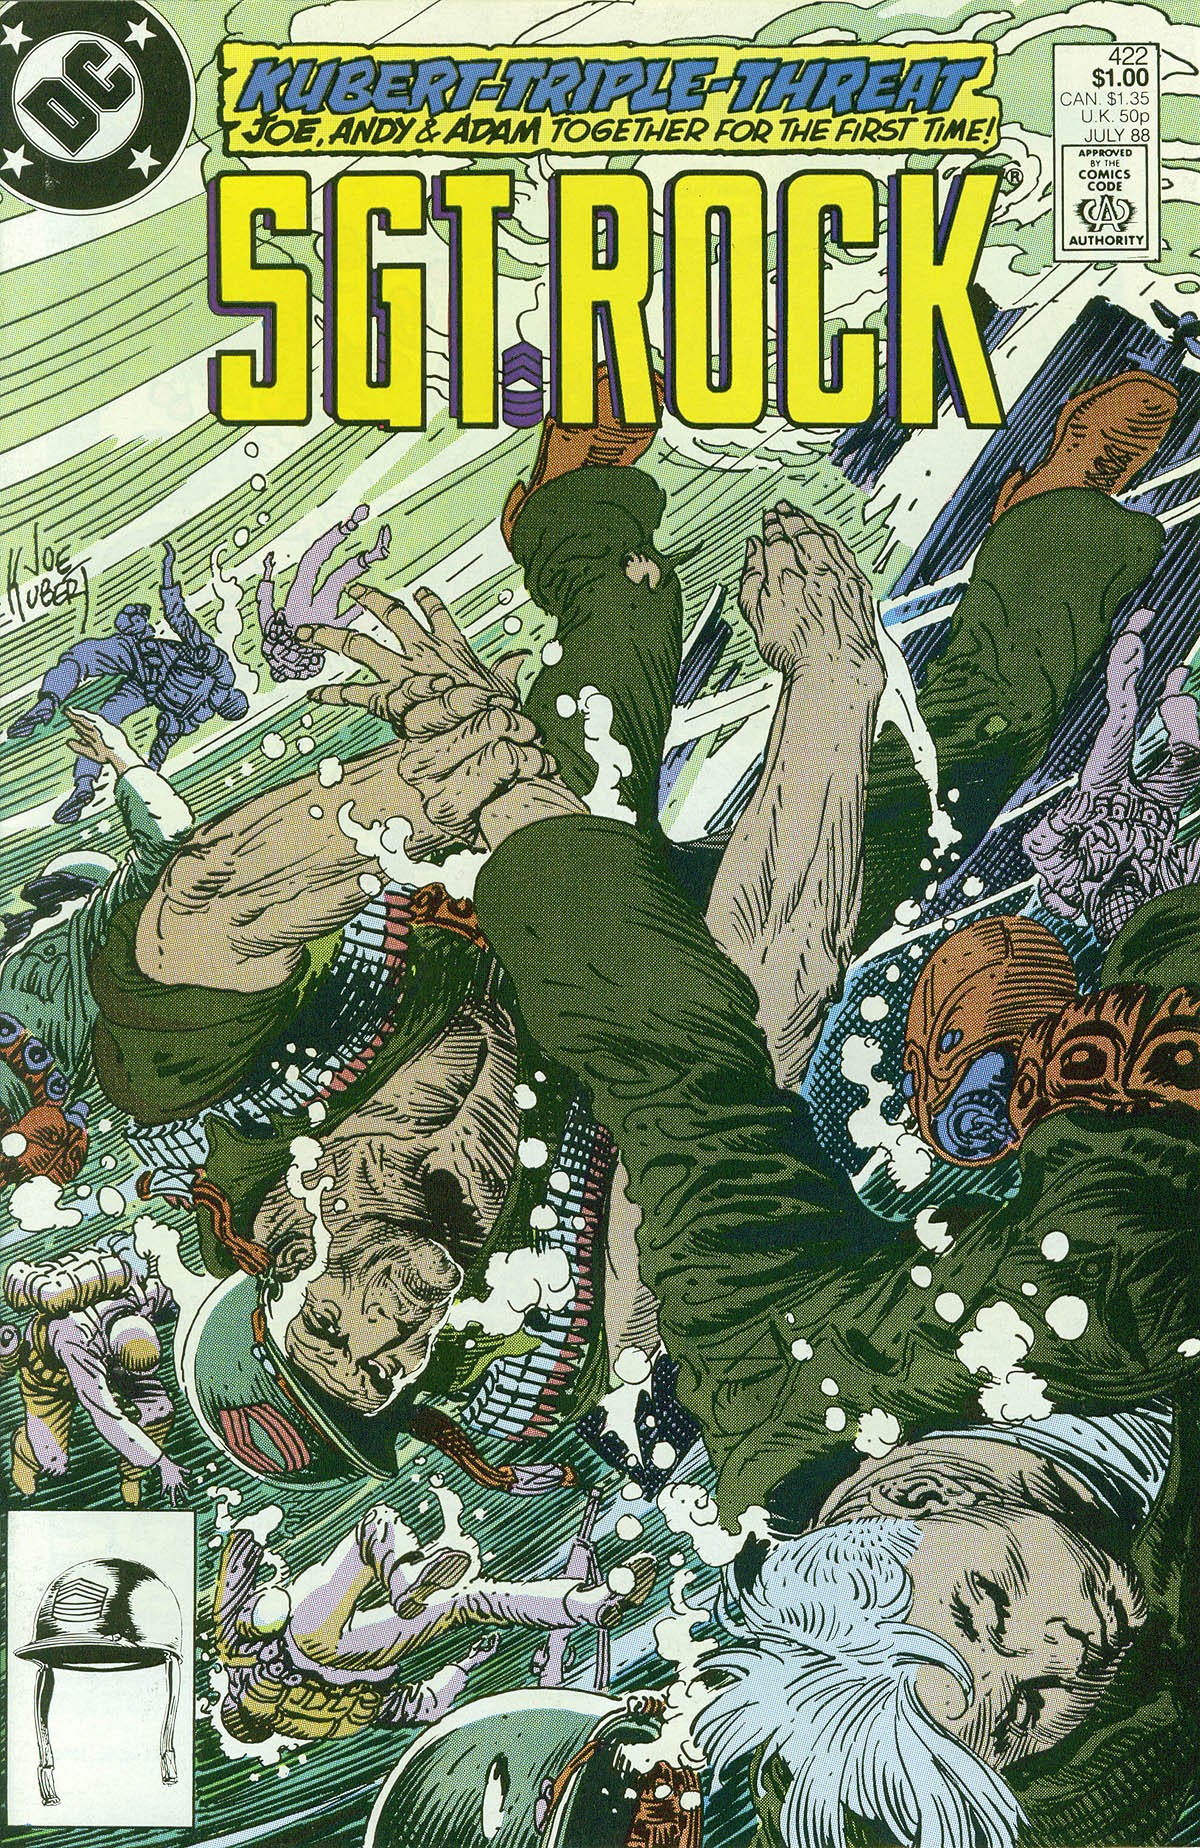 Read online Sgt. Rock comic -  Issue #422 - 1